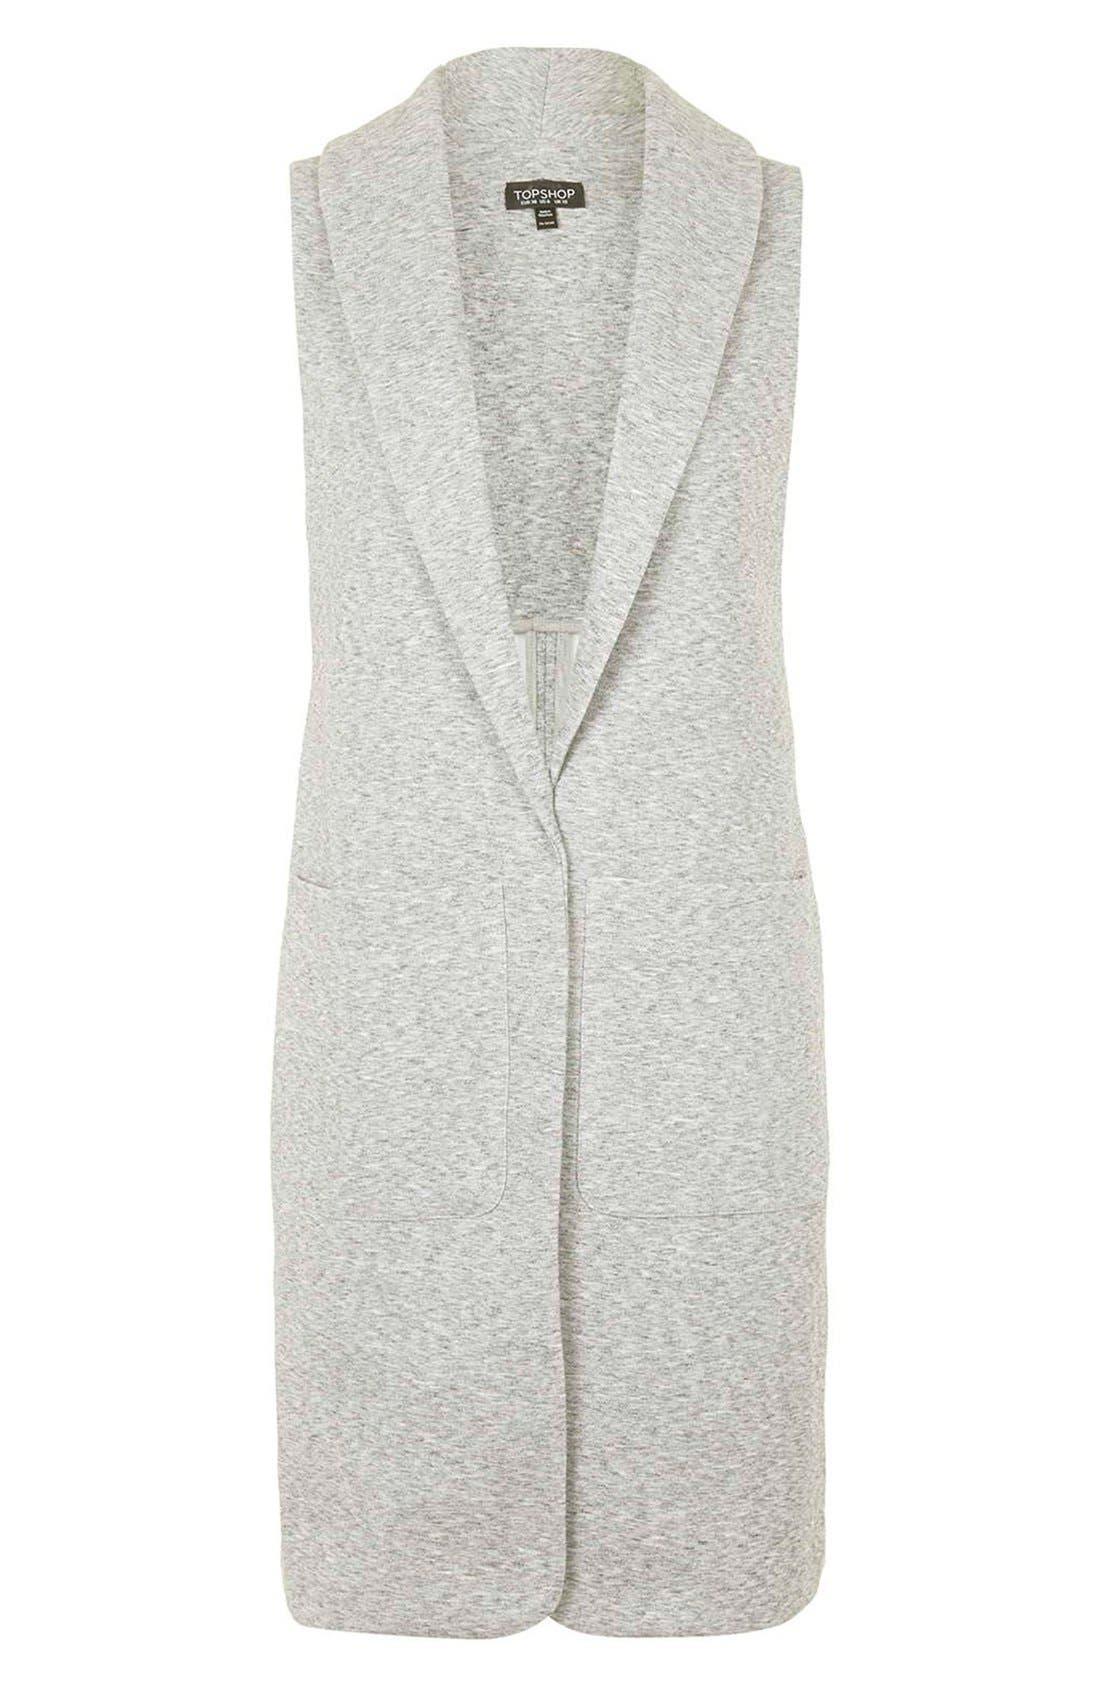 Marled Longline Vest,                             Alternate thumbnail 4, color,                             Light Grey